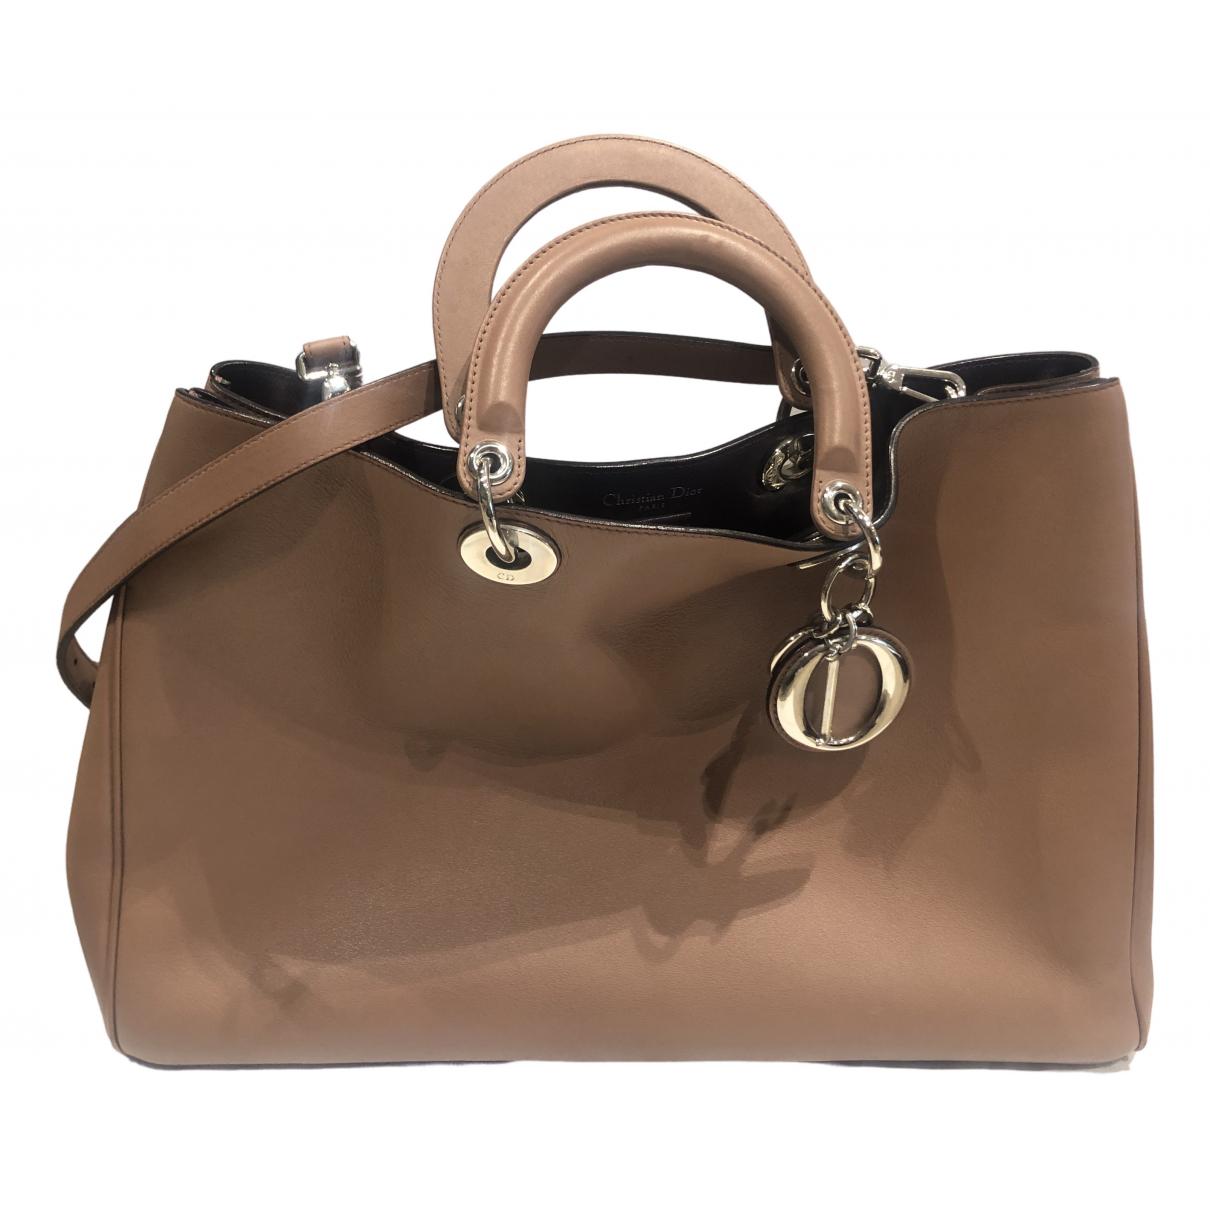 Dior Diorissimo Handtasche in Leder